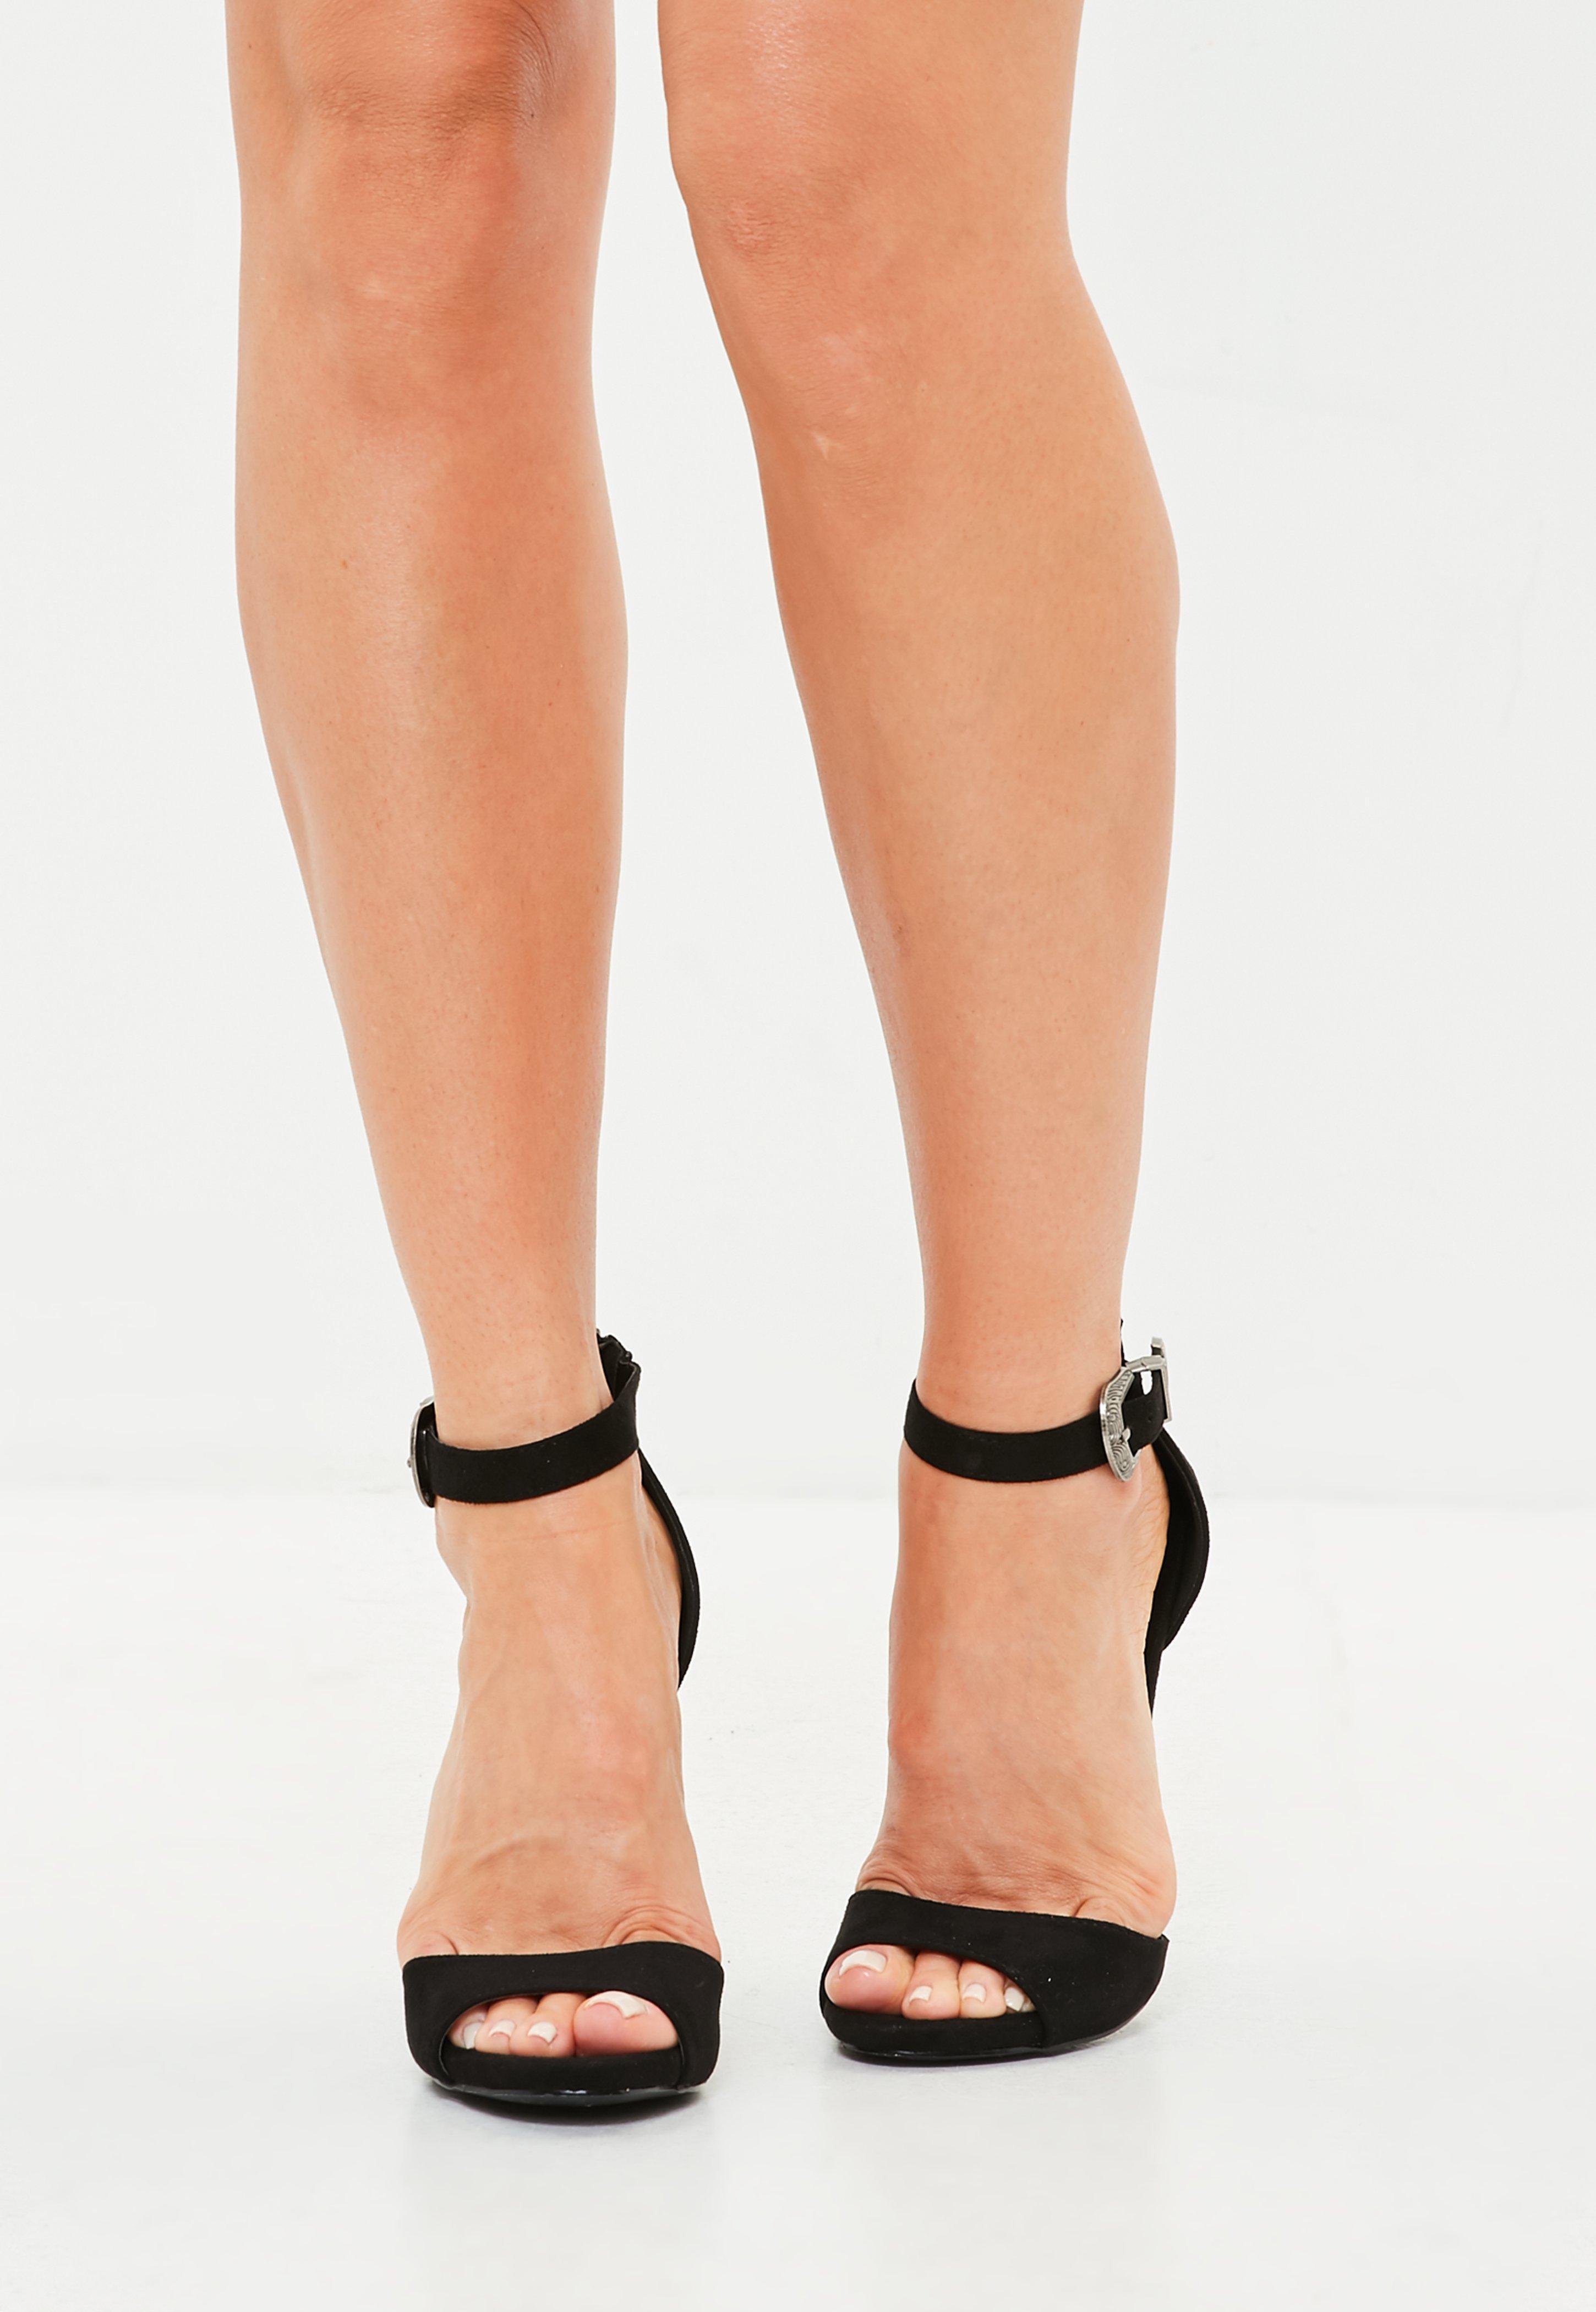 3a57a0c53e1 Missguided - Black Western Buckle High Heel Sandals - Lyst. View fullscreen